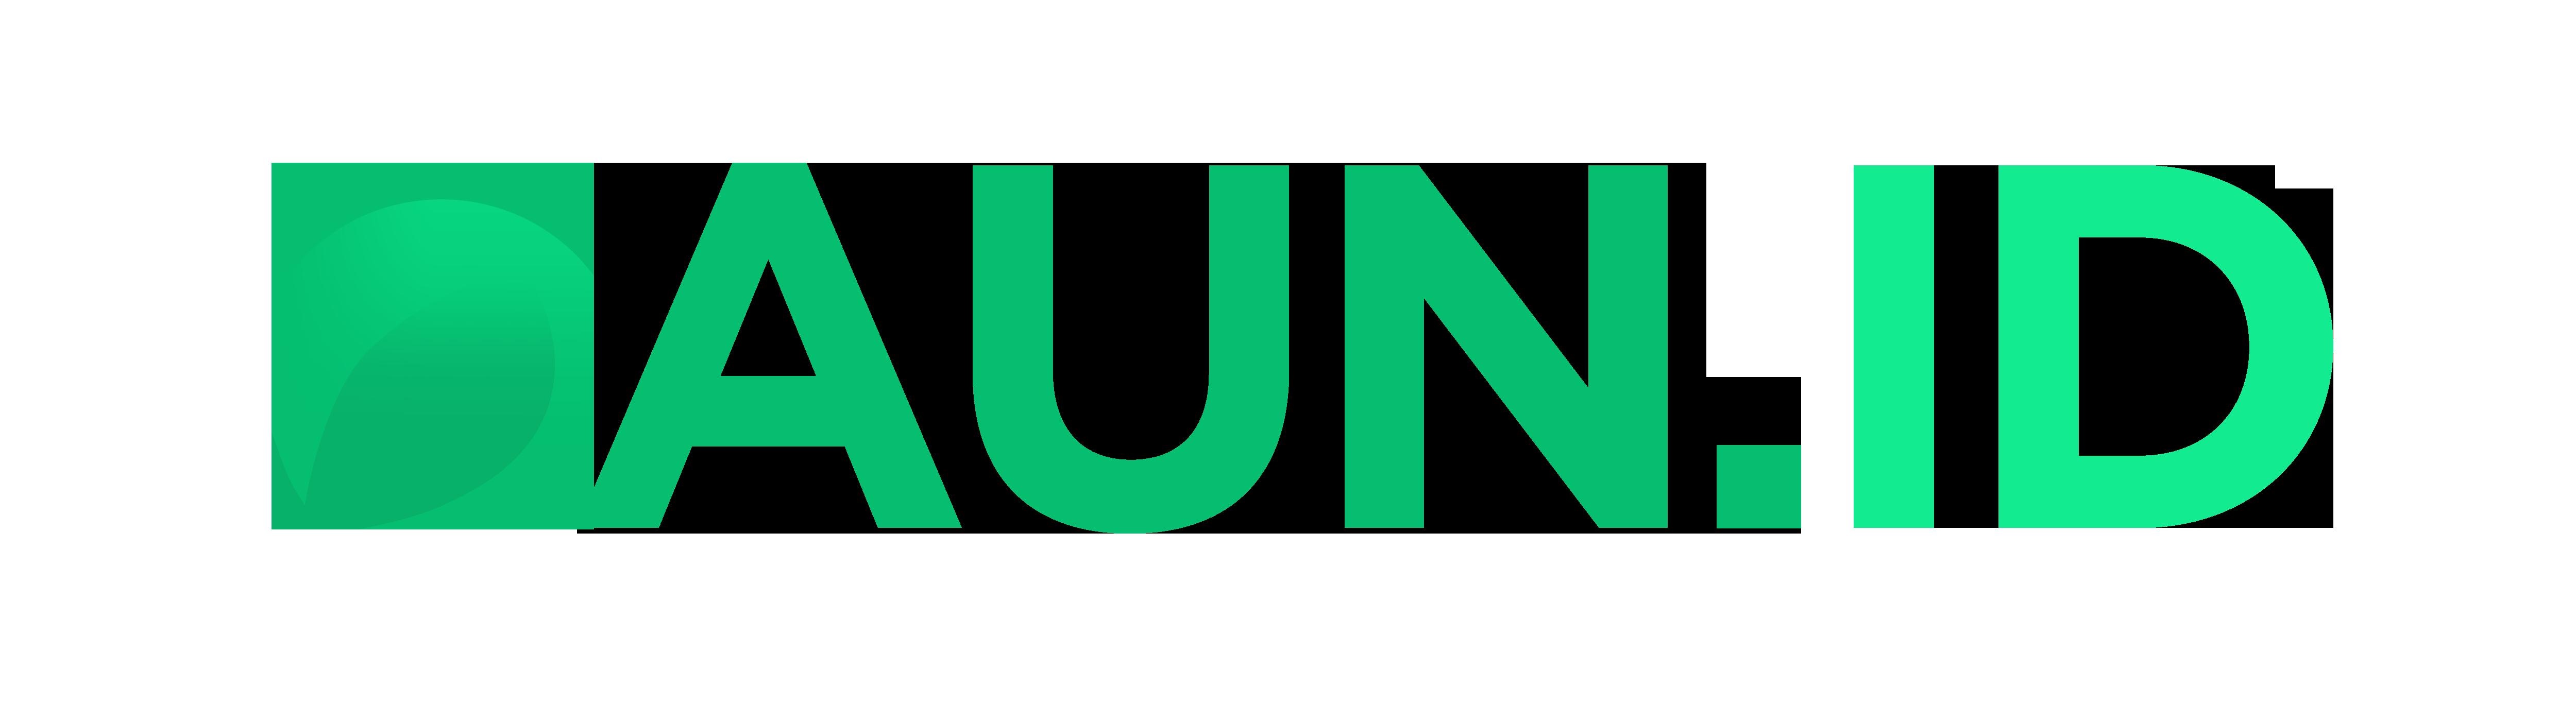 Daun.id Logo